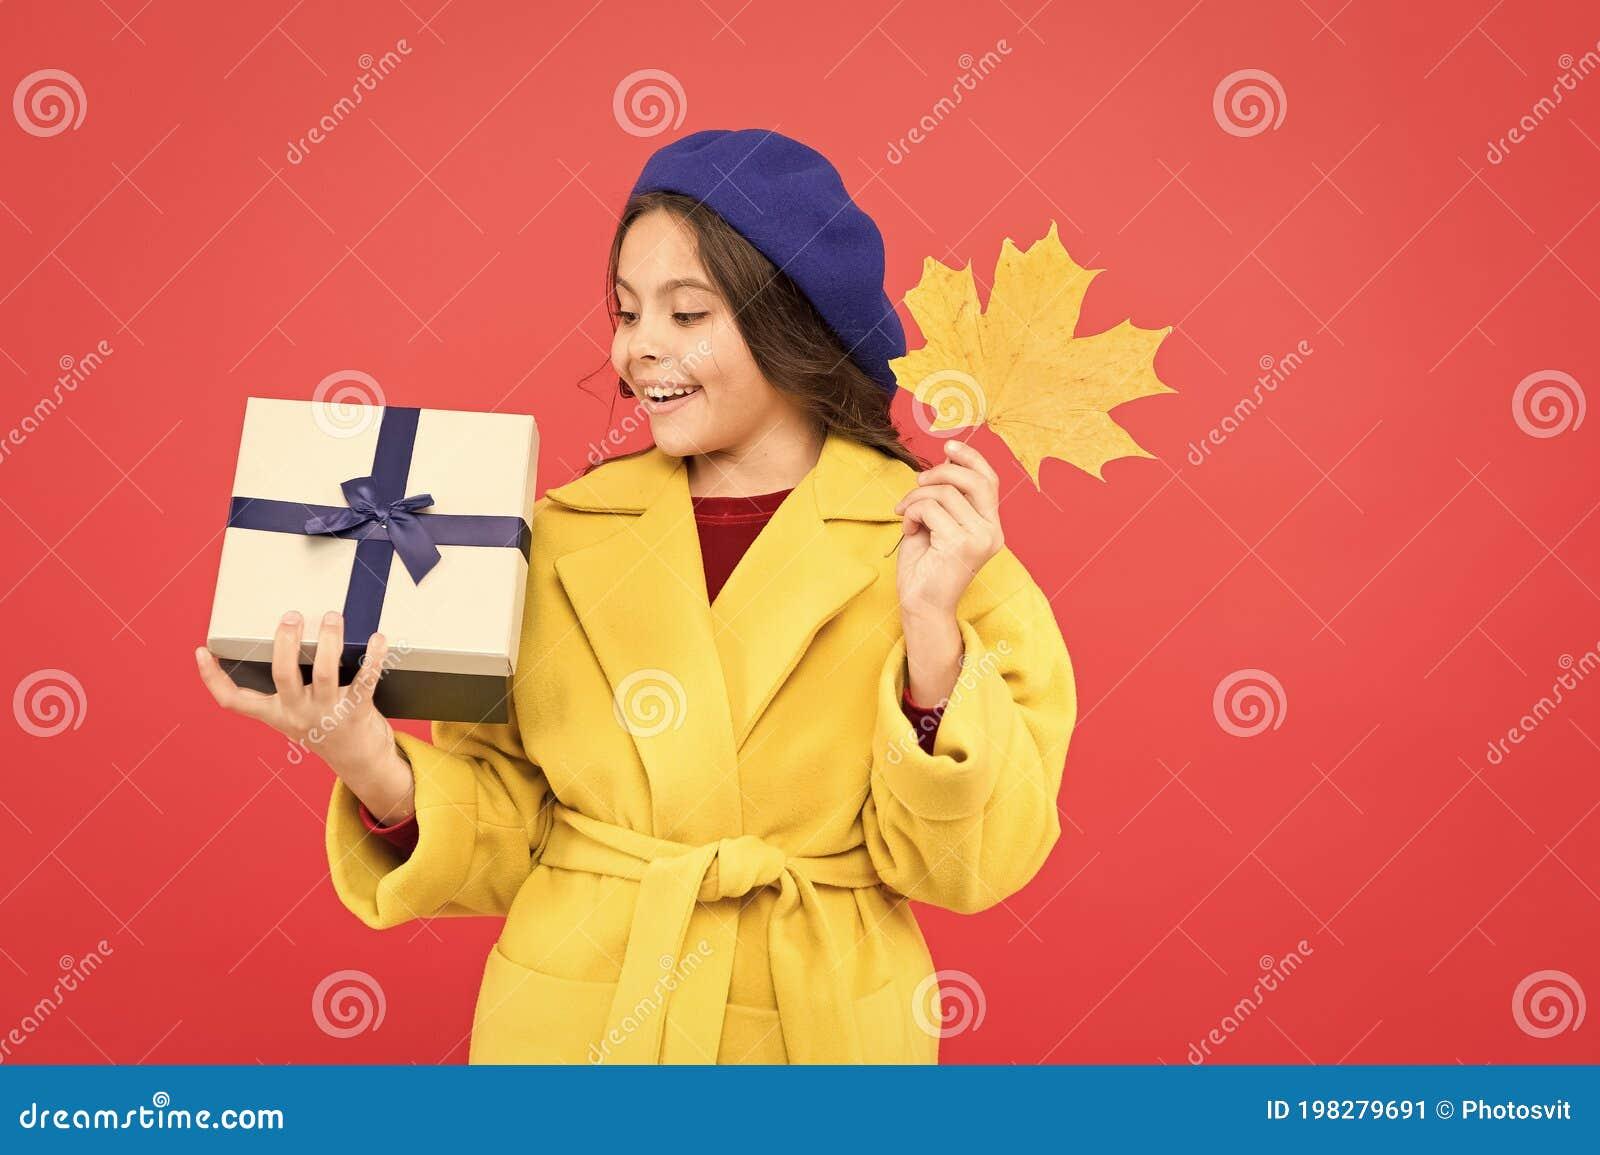 So Beautiful. Autumn Kid Fashion. Happy Small Girl With Maple Leaf ...